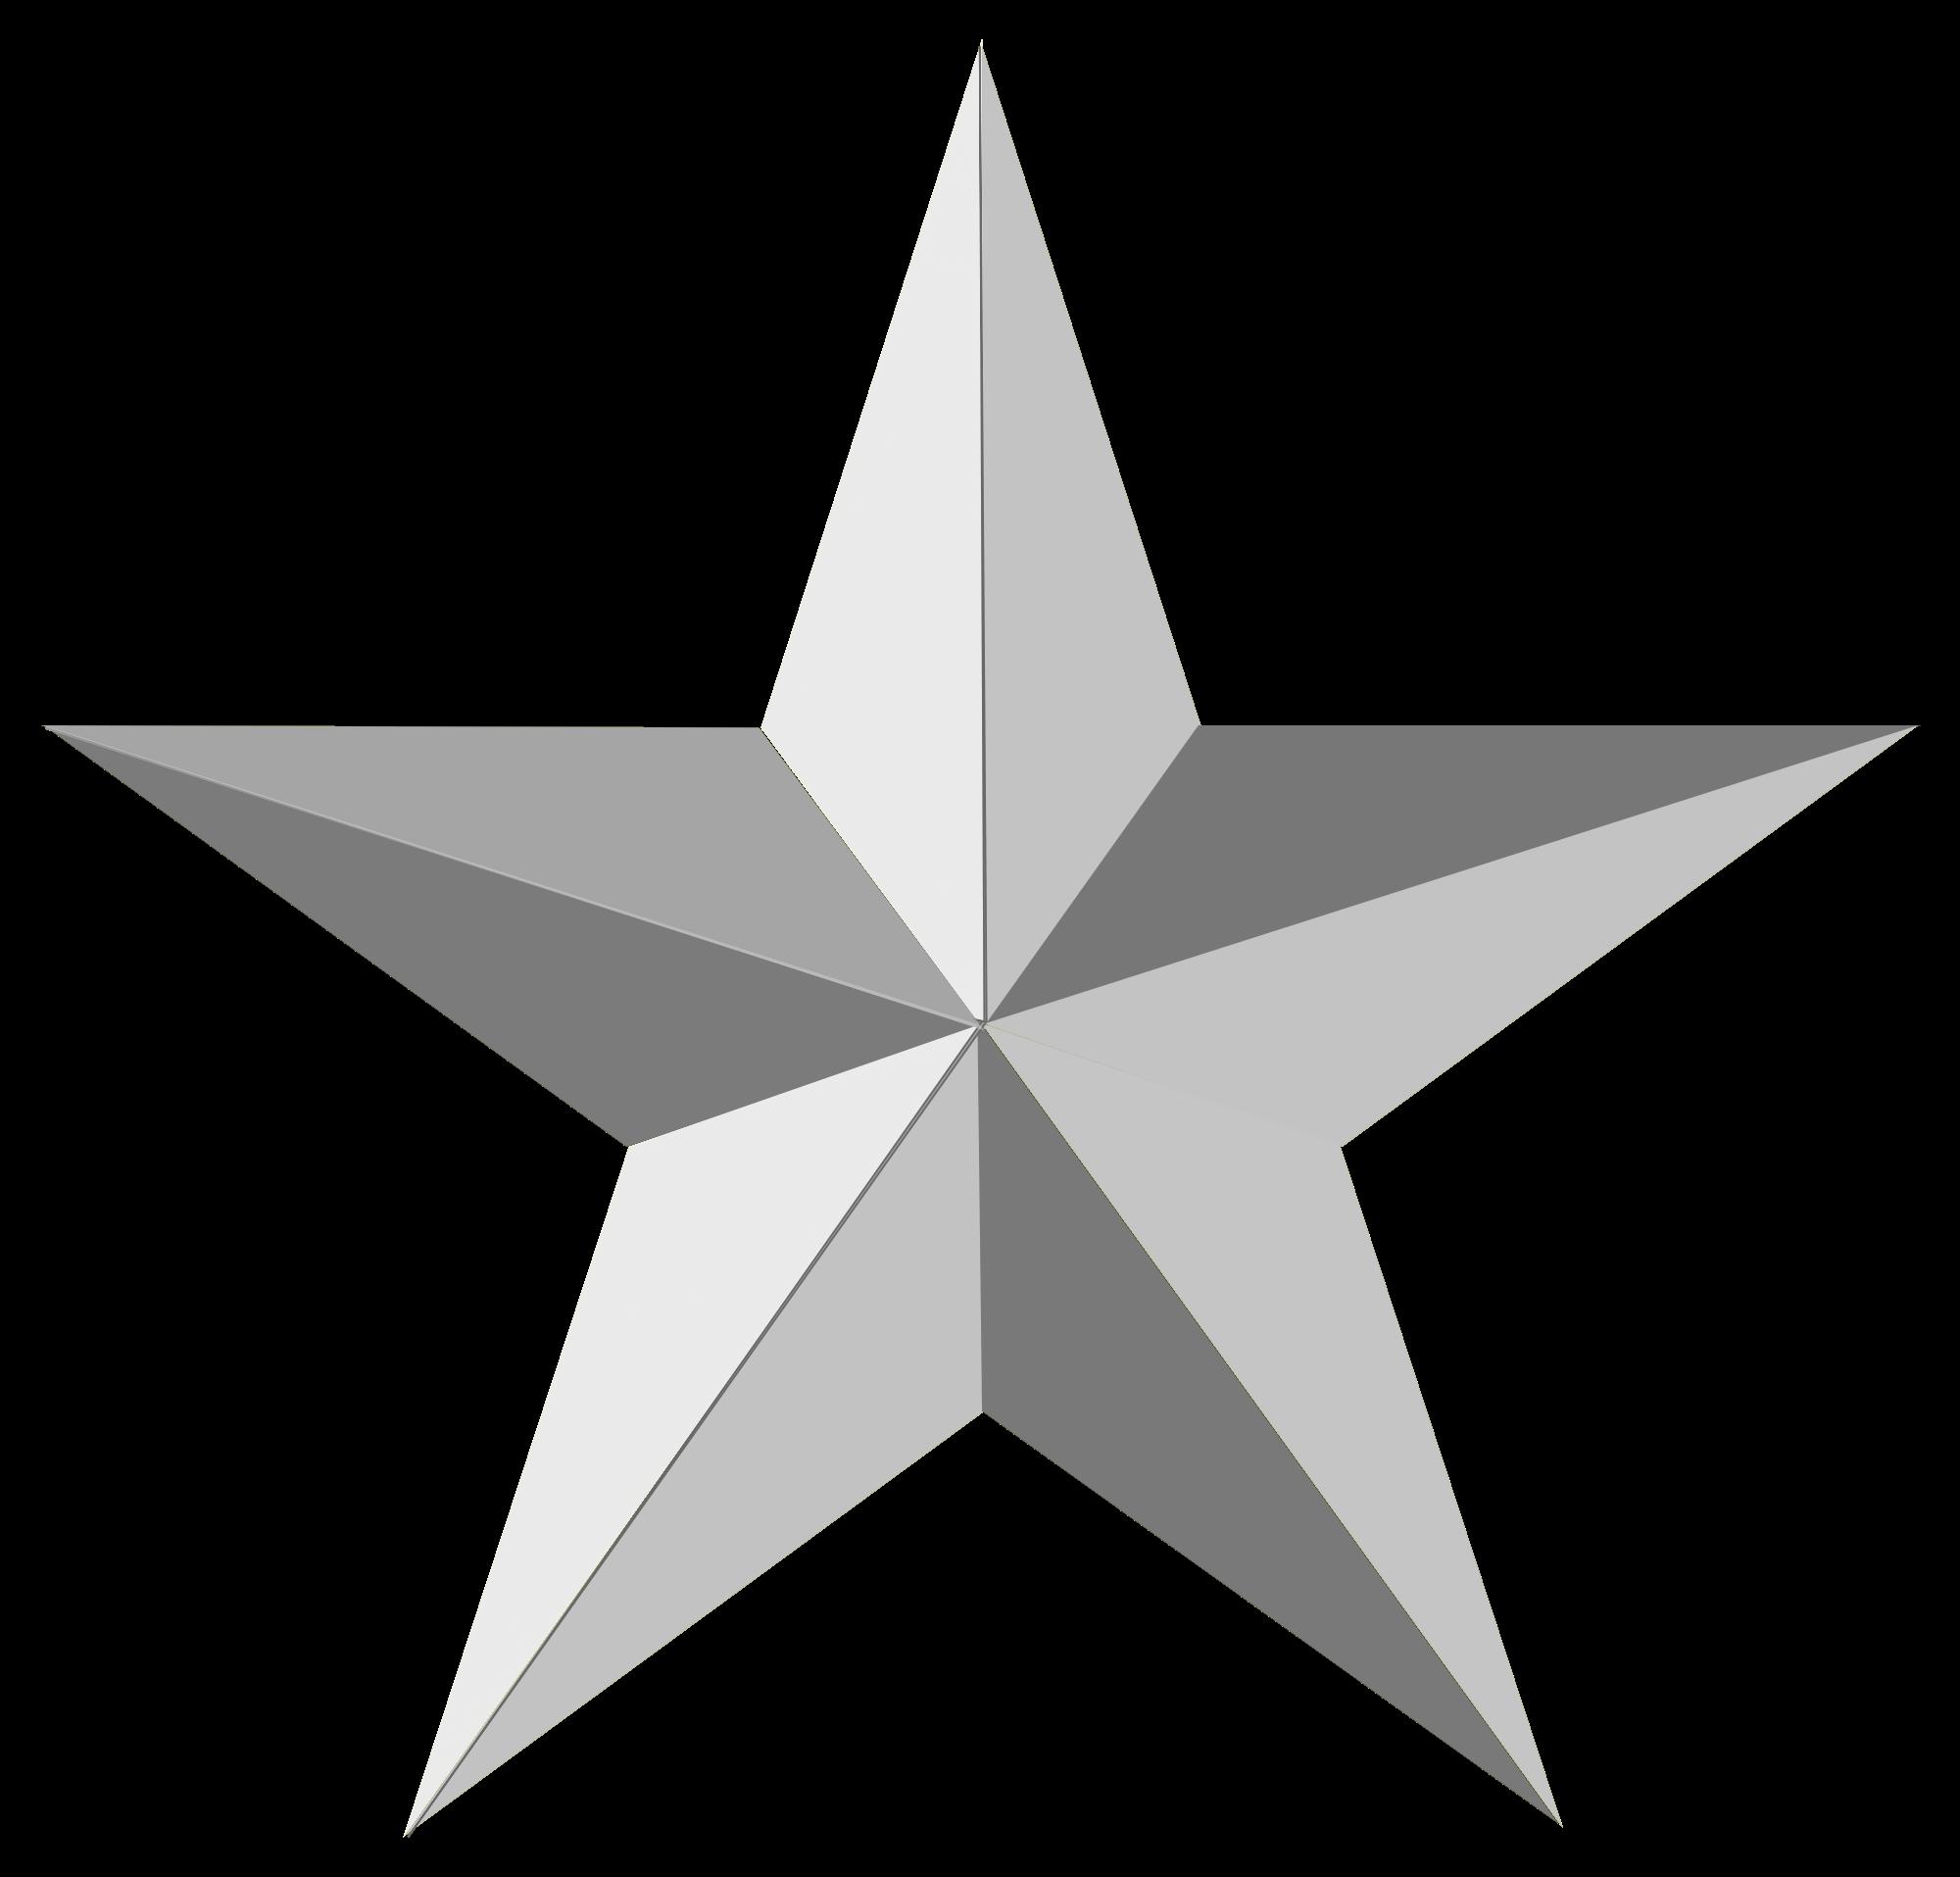 Star PNG Transparent image - Star PNG